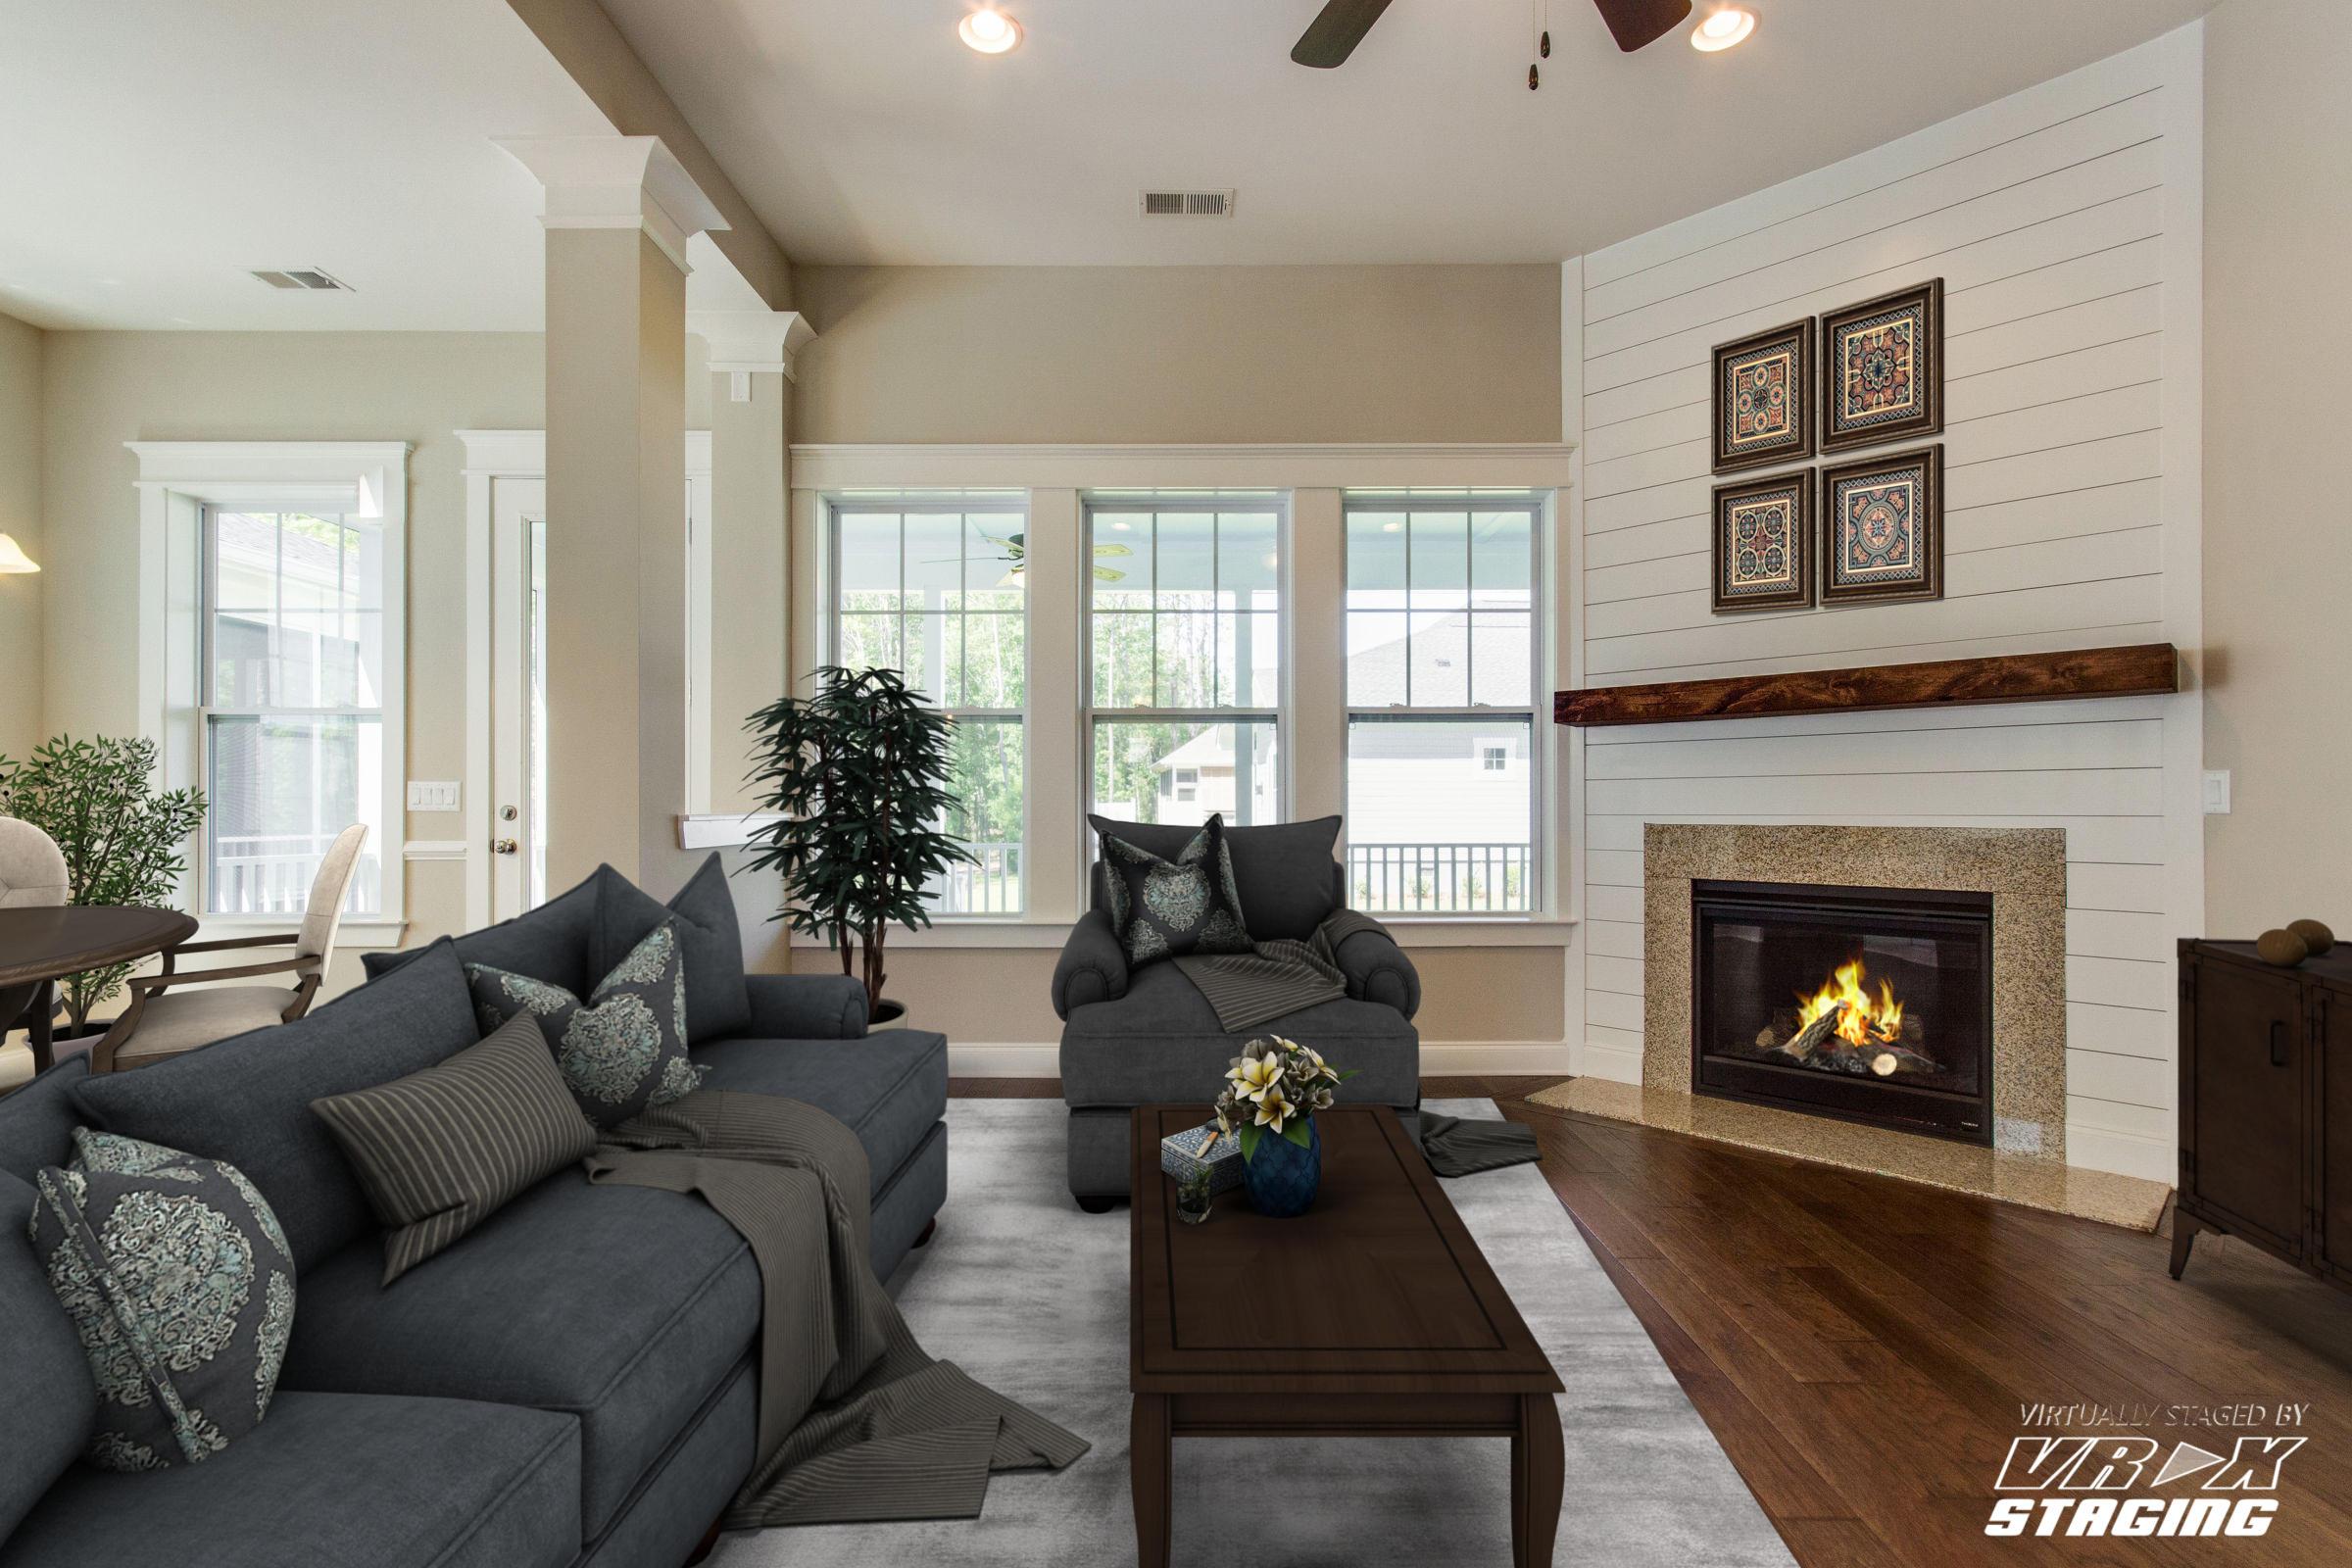 Carolina Park Homes For Sale - 1583 Old Rivers Gate, Mount Pleasant, SC - 31